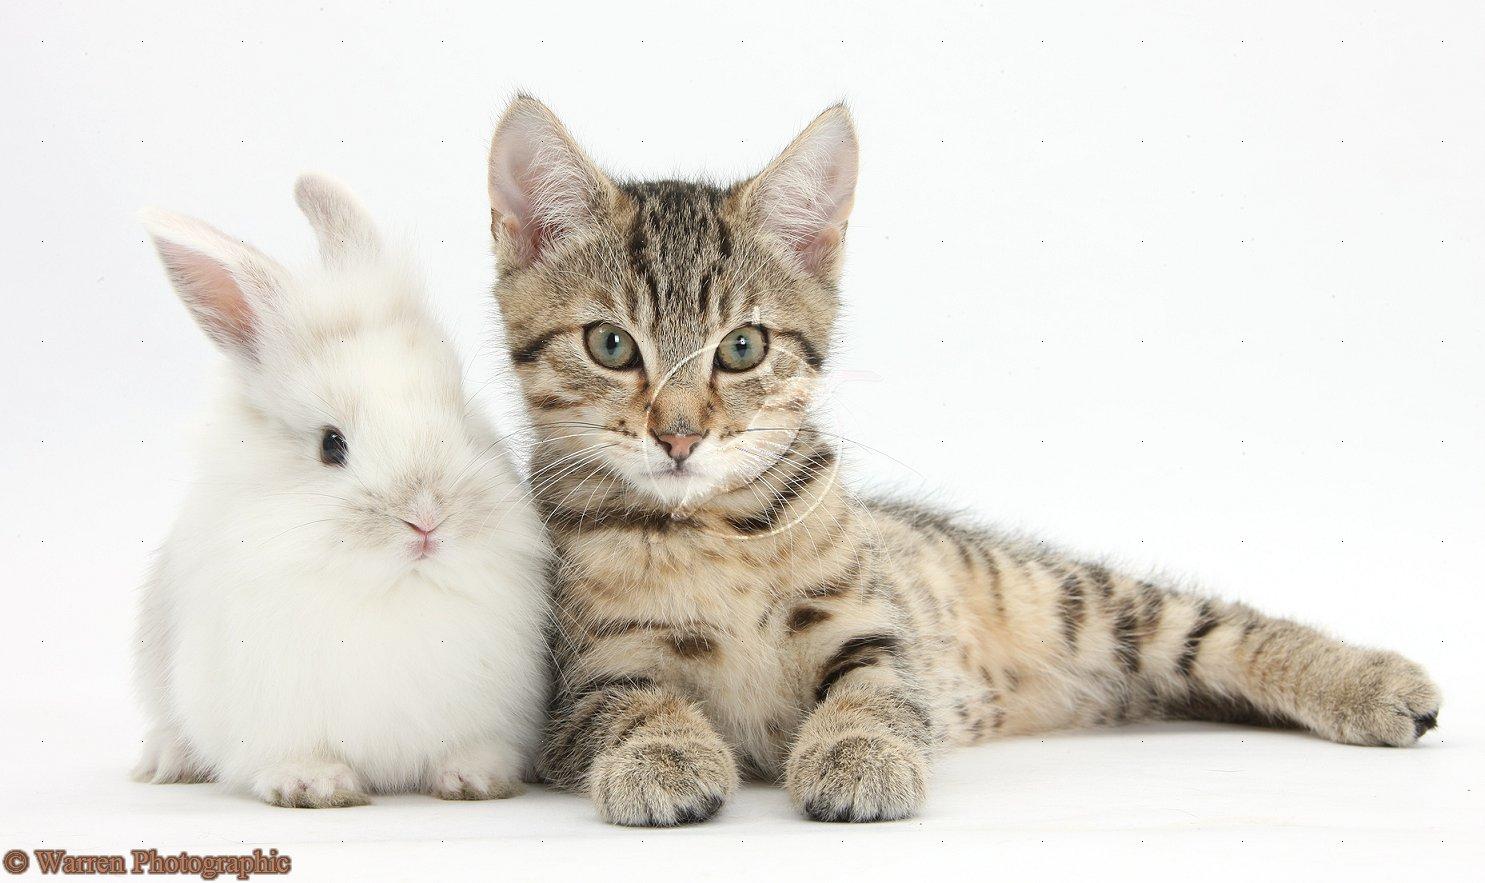 worlds tiniest cat